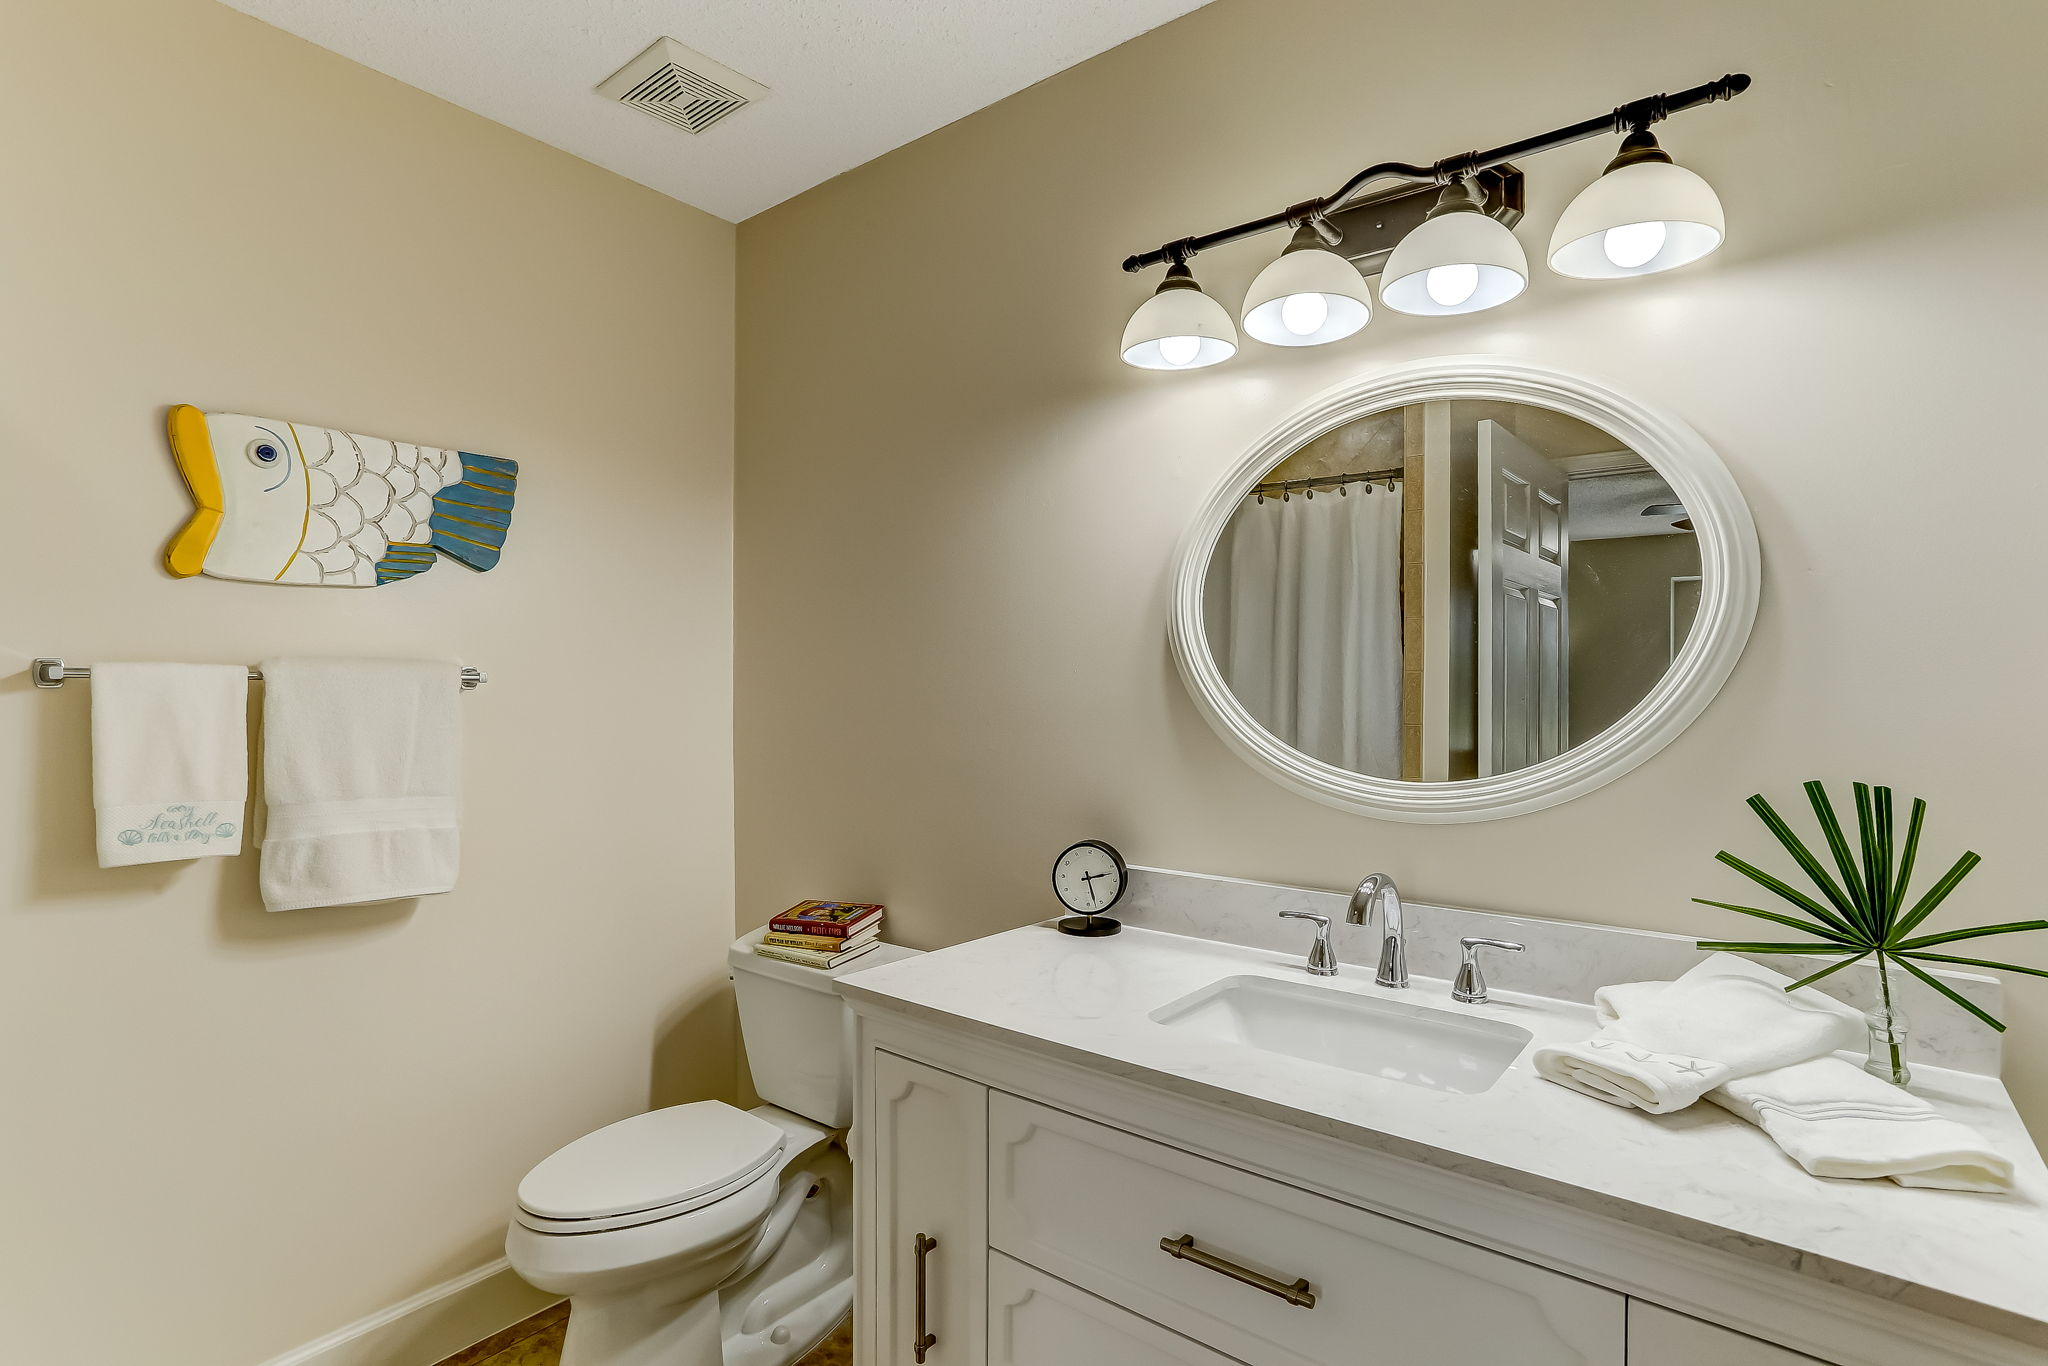 Ensuite master bath with travertine tiled shower